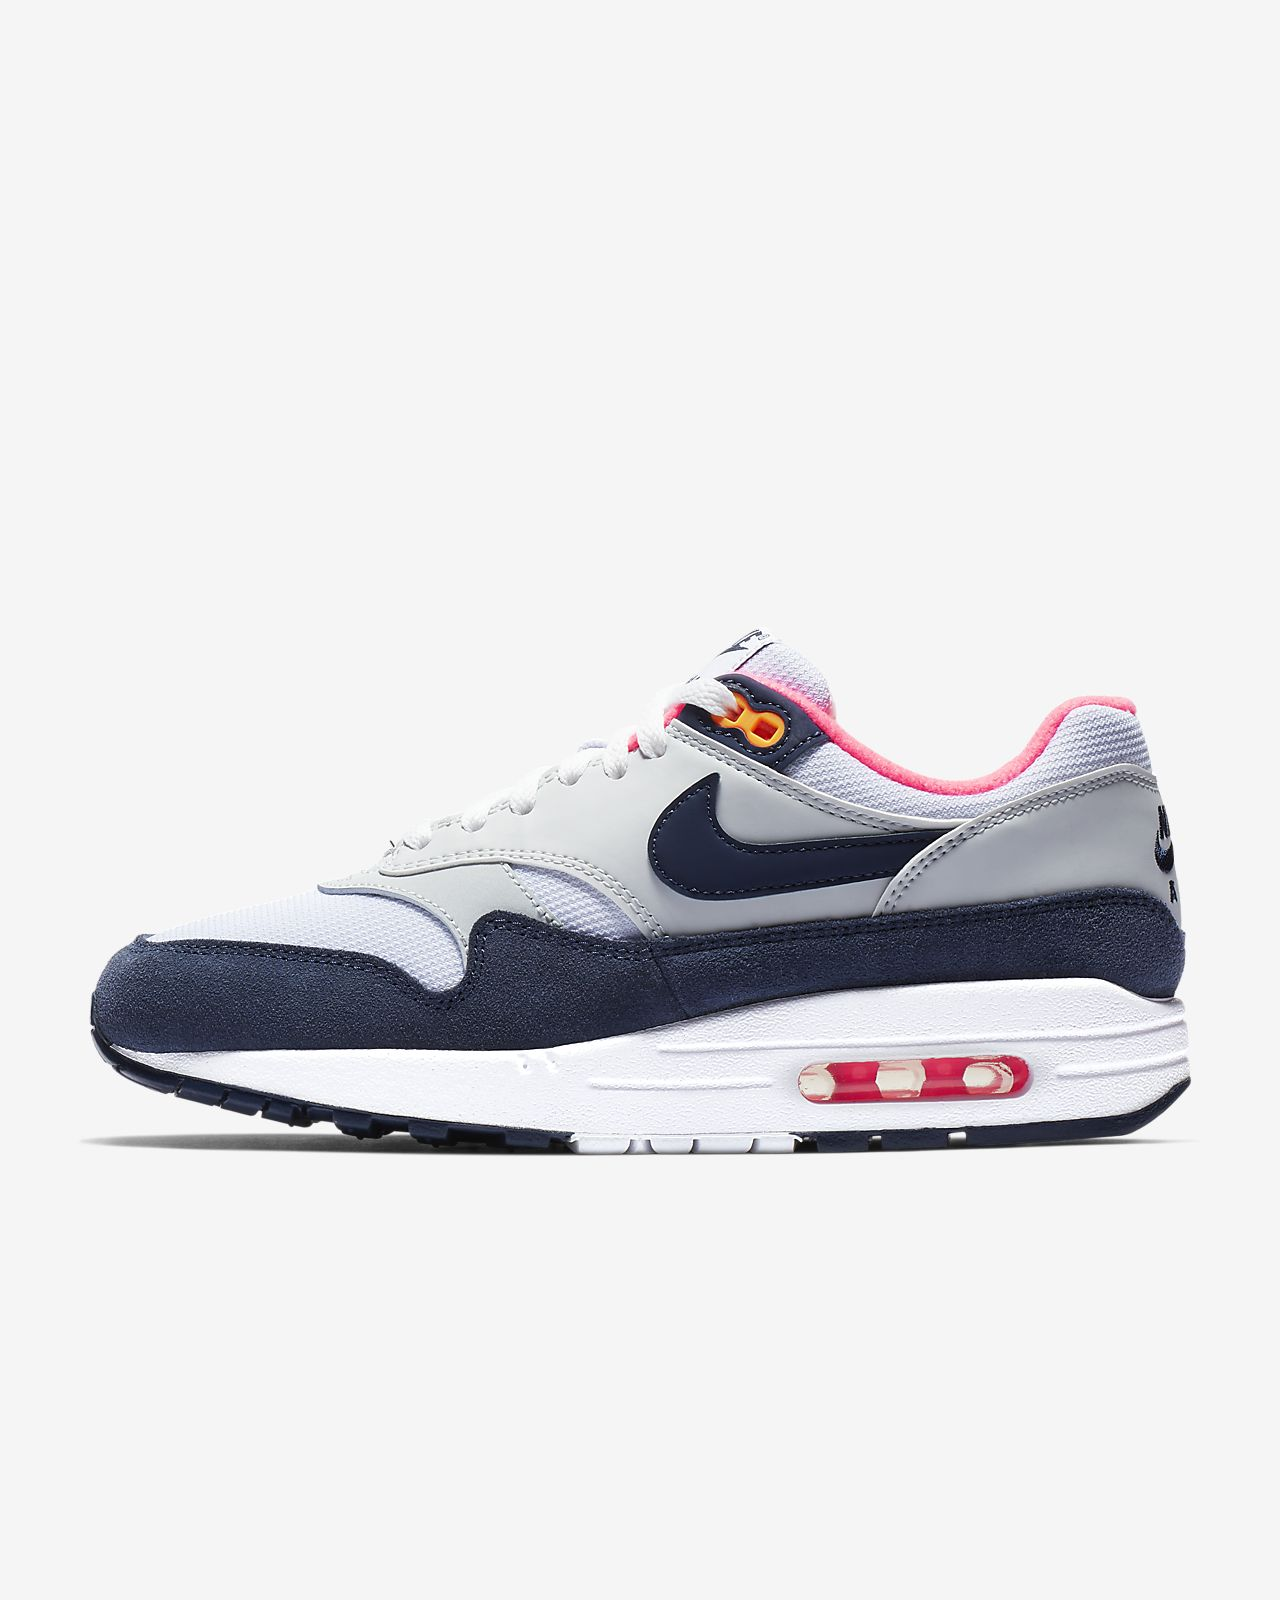 e5a392ef ... ireland nike air max 1 premium sko til kvinder 44f30 f6205